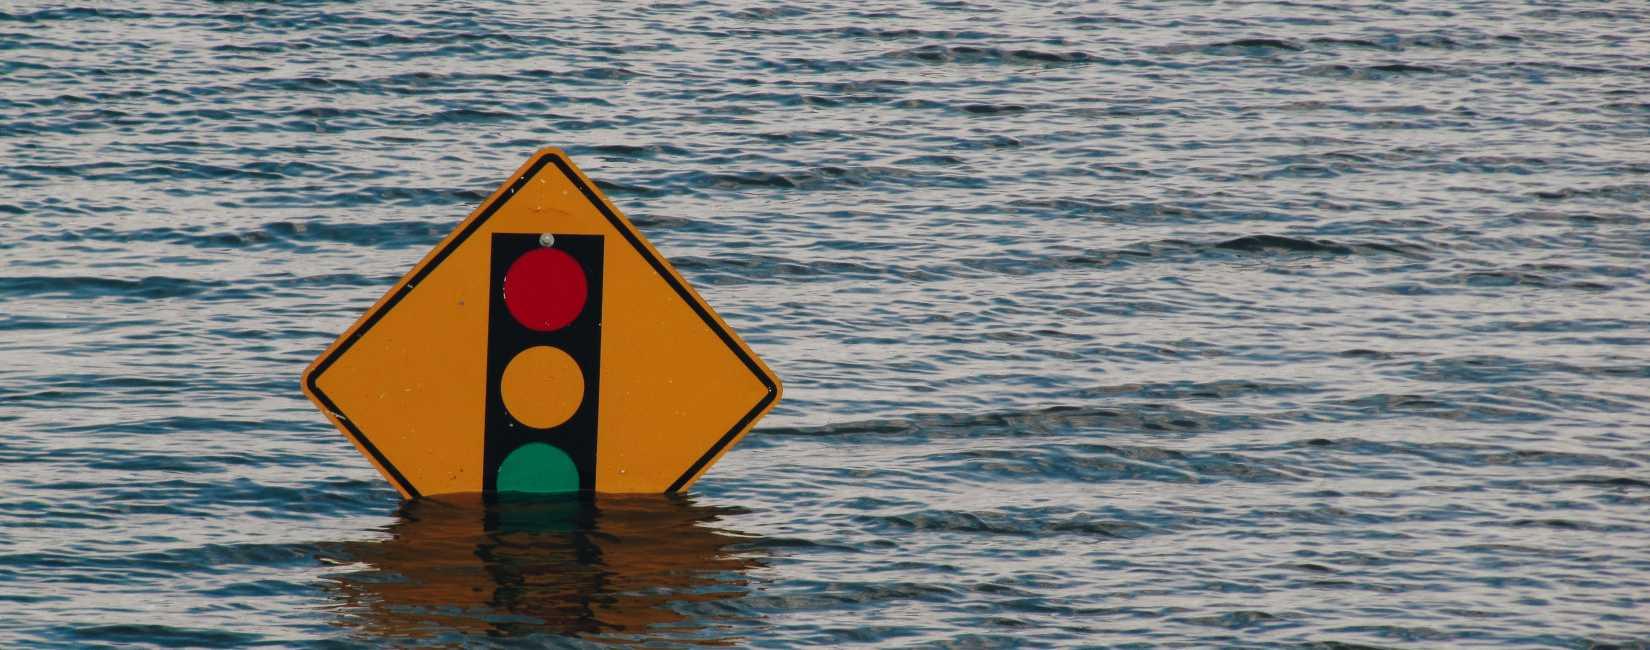 Trafikkskilt under vann